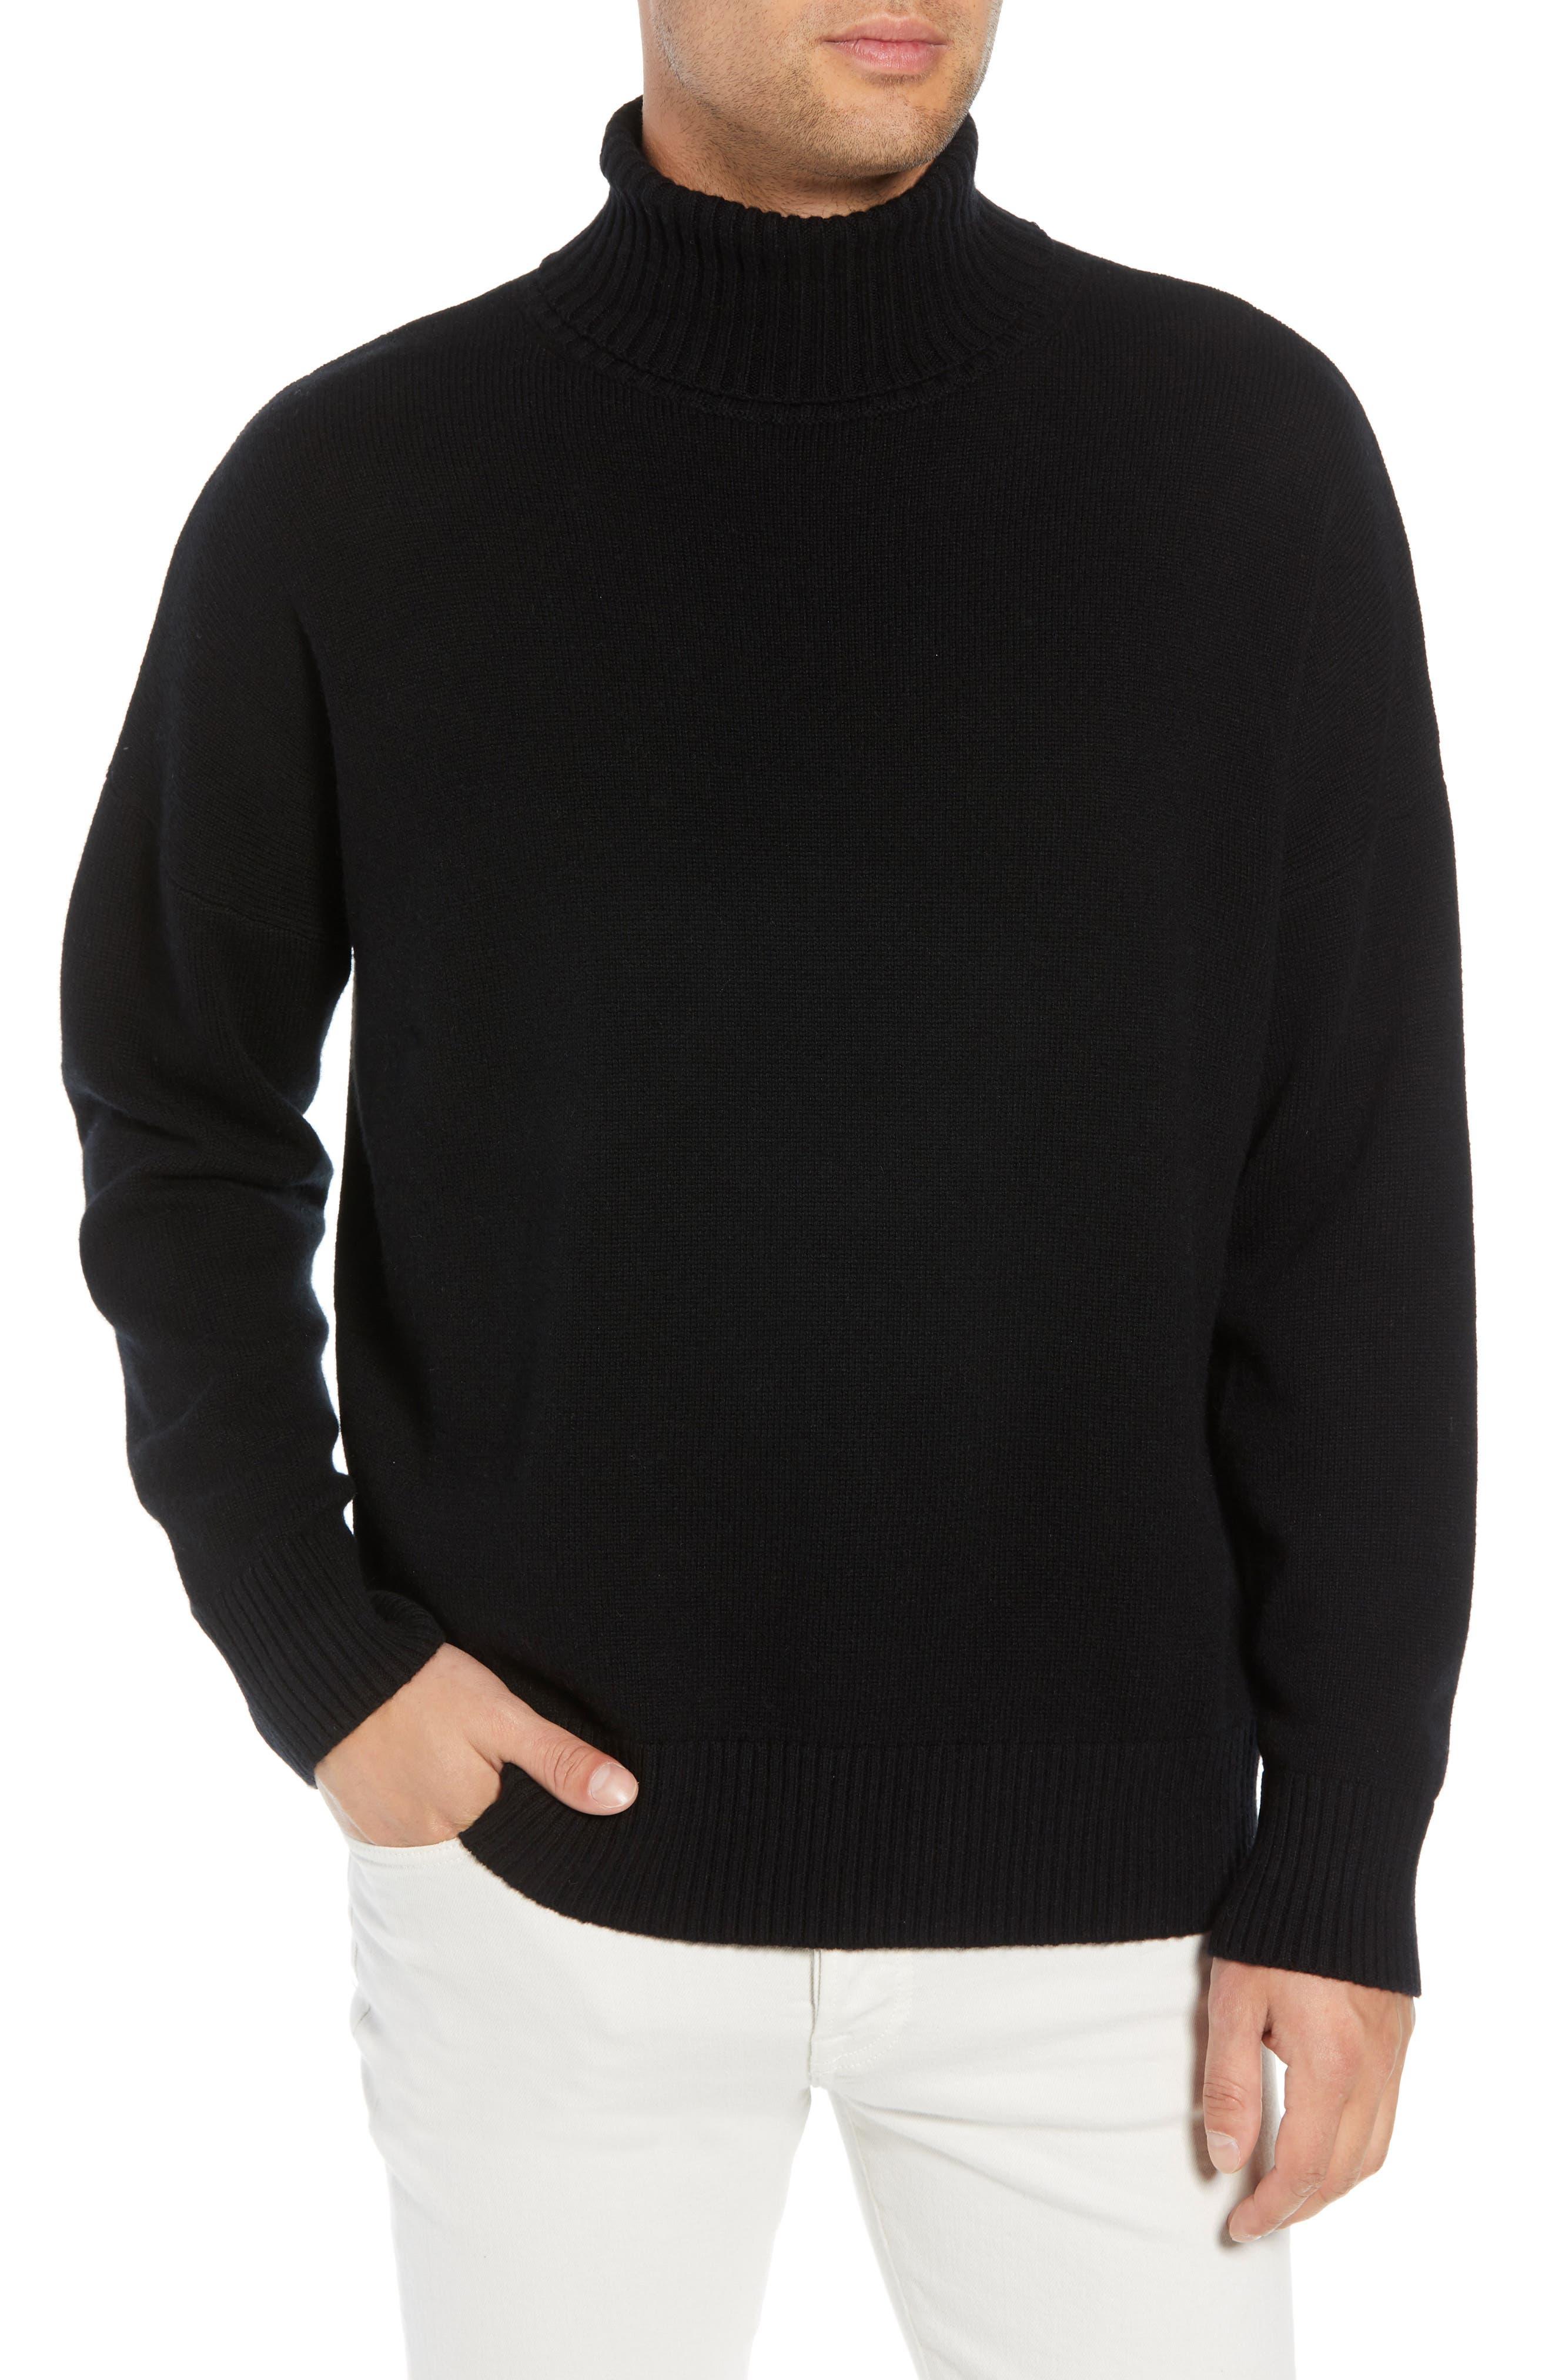 THE KOOPLES Wool & Cashmere Turtleneck Sweater in Black